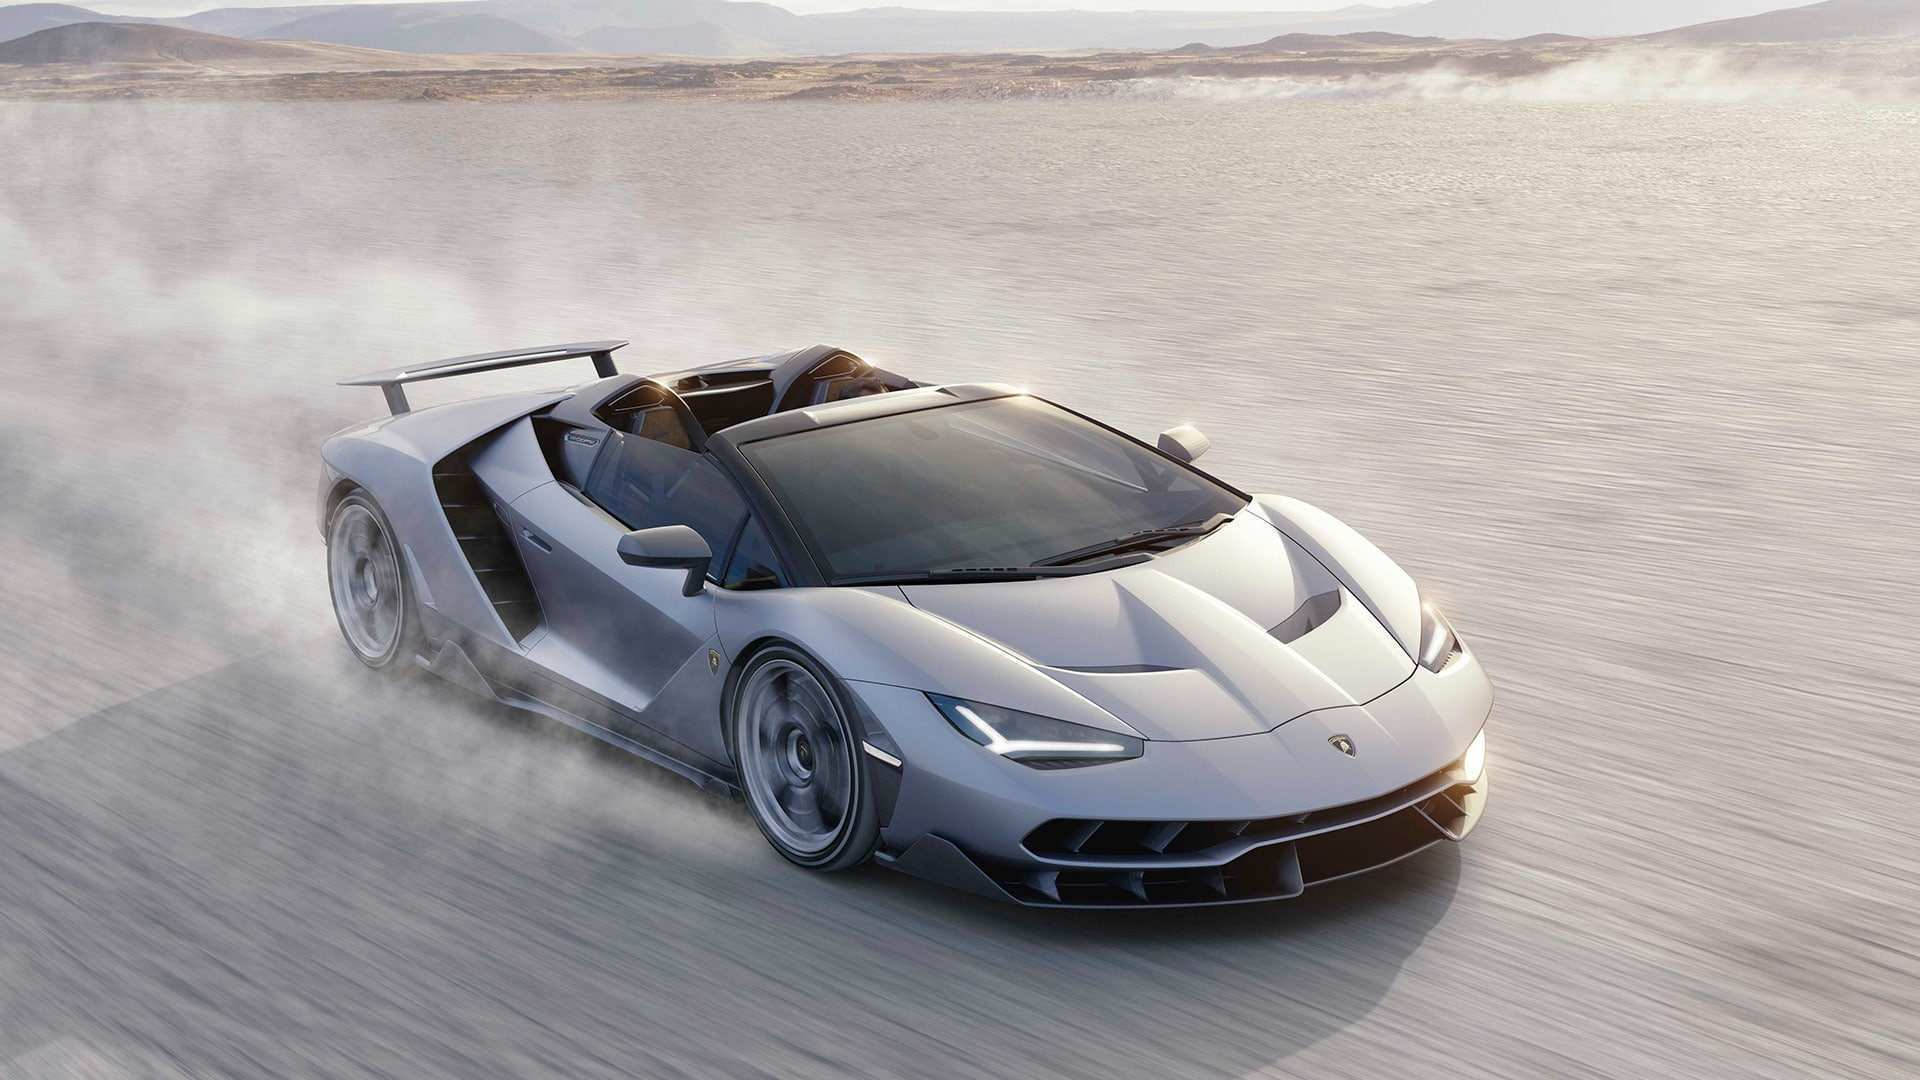 24 The 2019 Lamborghini Centenario Review with 2019 Lamborghini Centenario